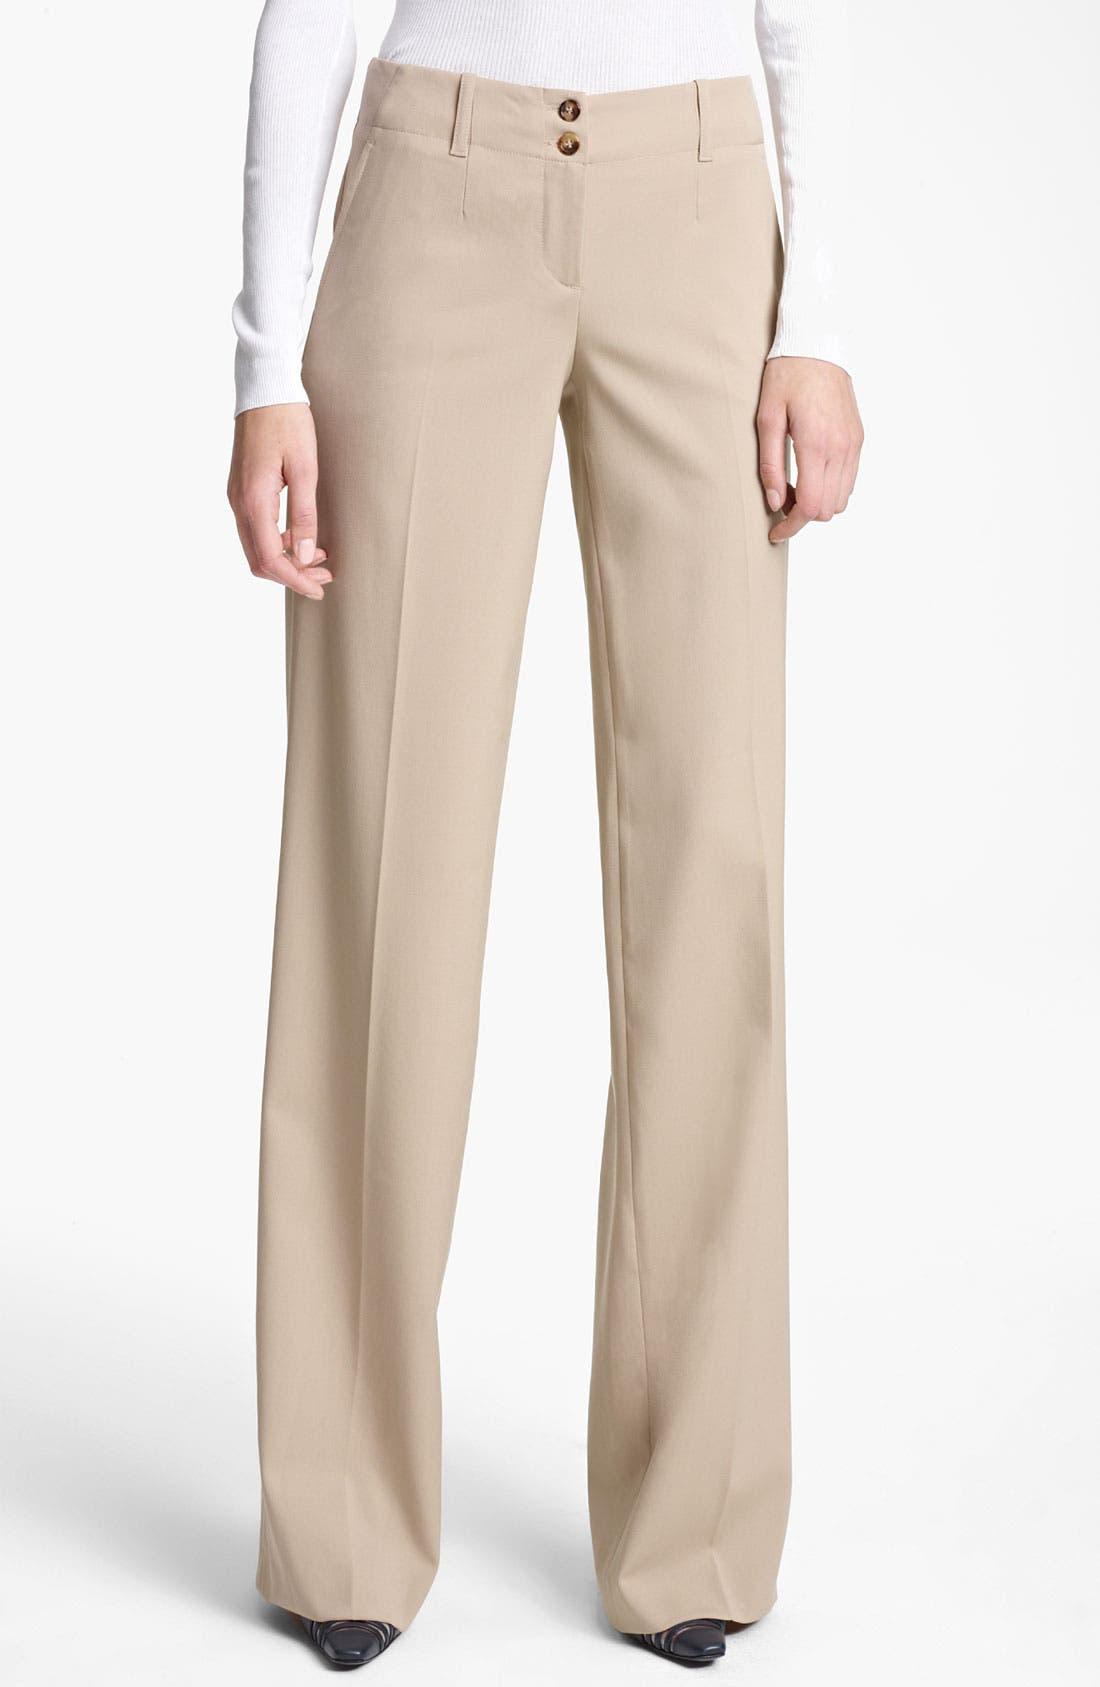 Alternate Image 1 Selected - Michael Kors Wide Leg Stretch Gabardine Trousers